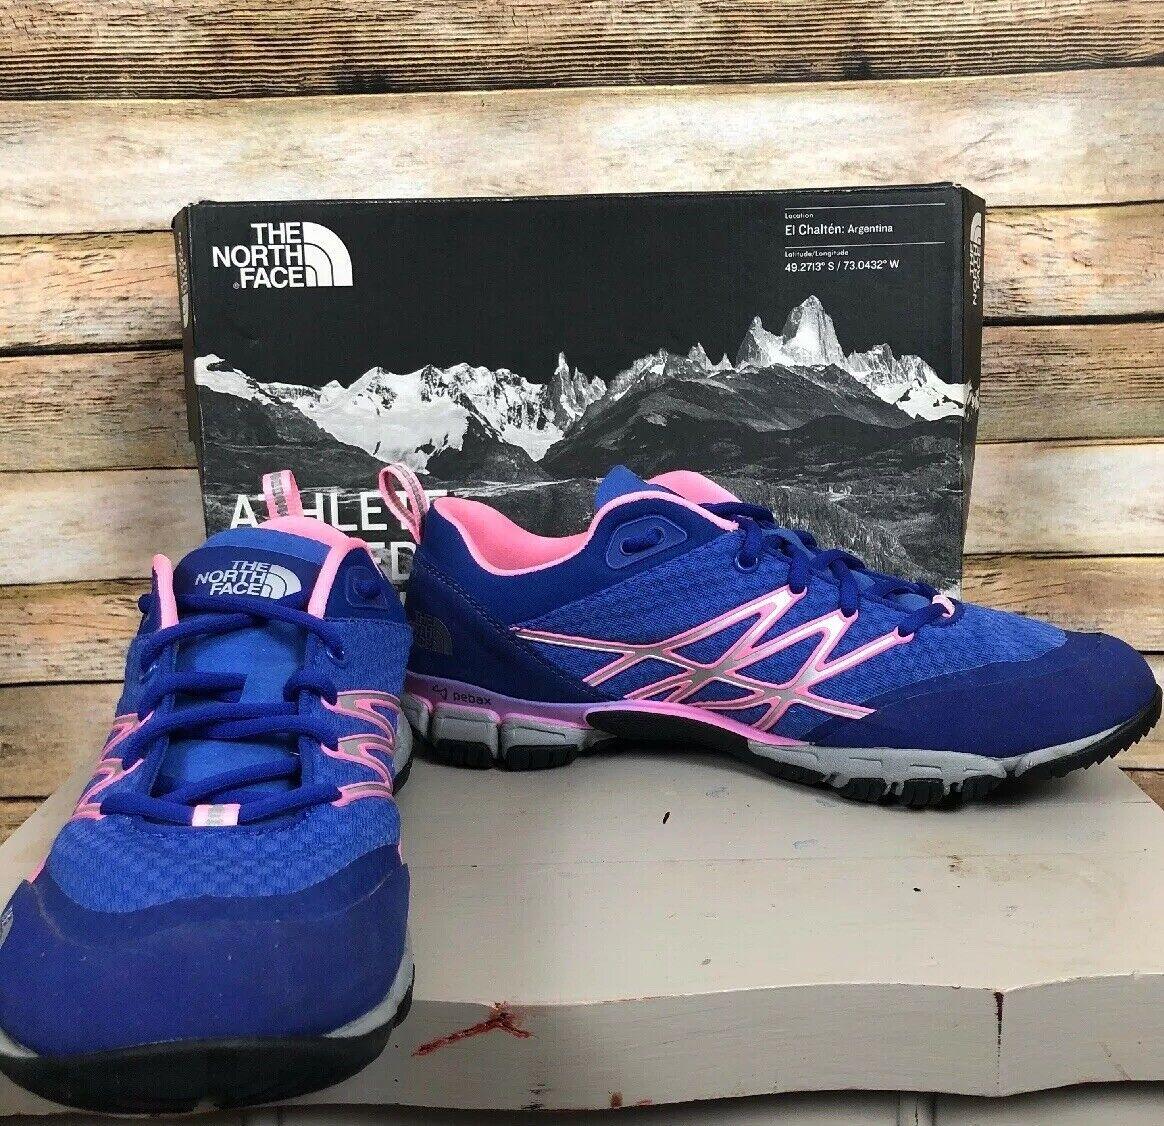 The North Face Ultra Kilowatt Women's Running shoes Size 10.5 New